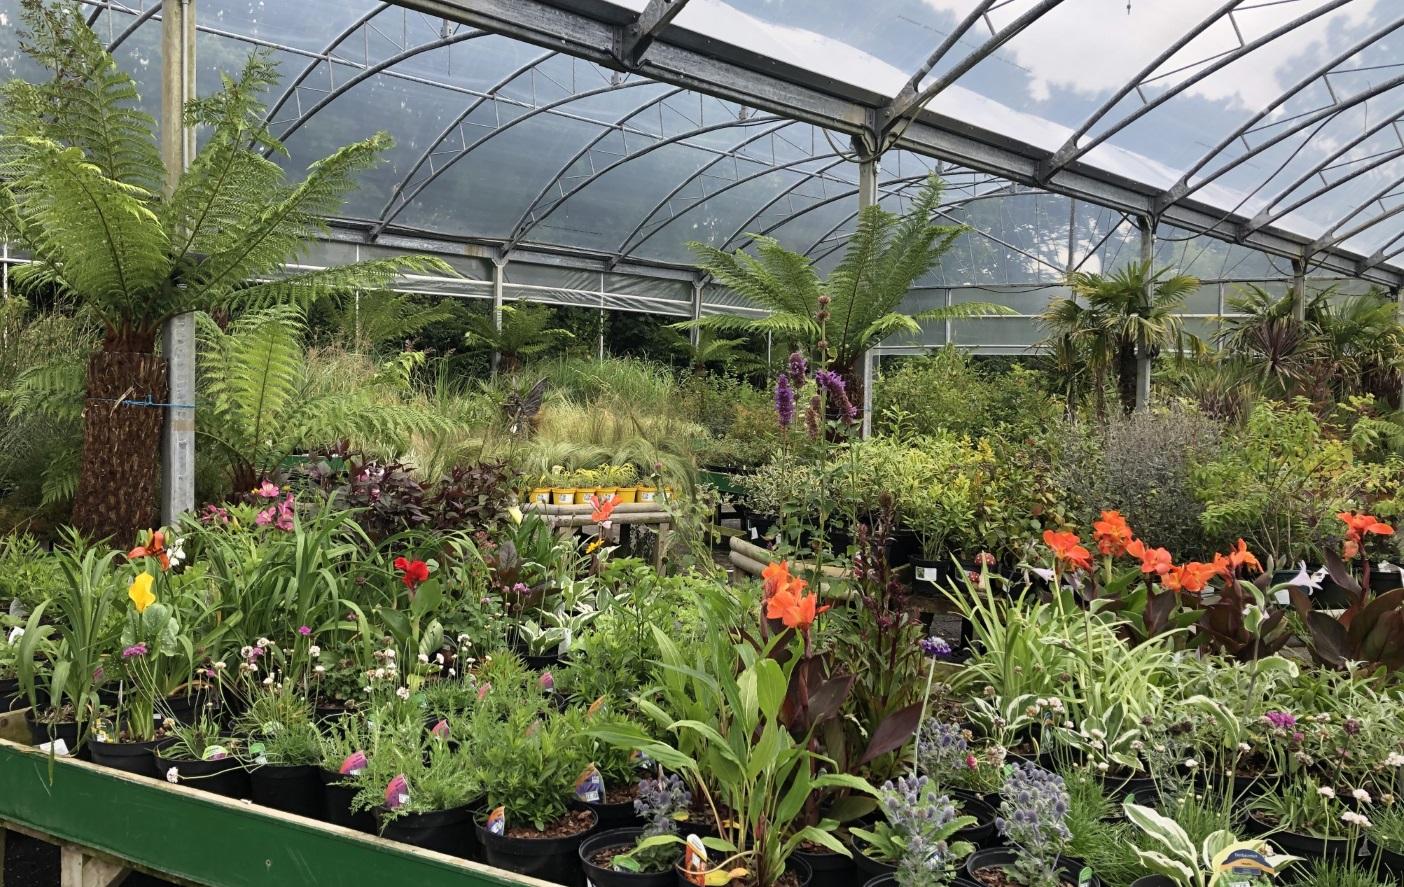 Trevena Cross Undercover Plant Area